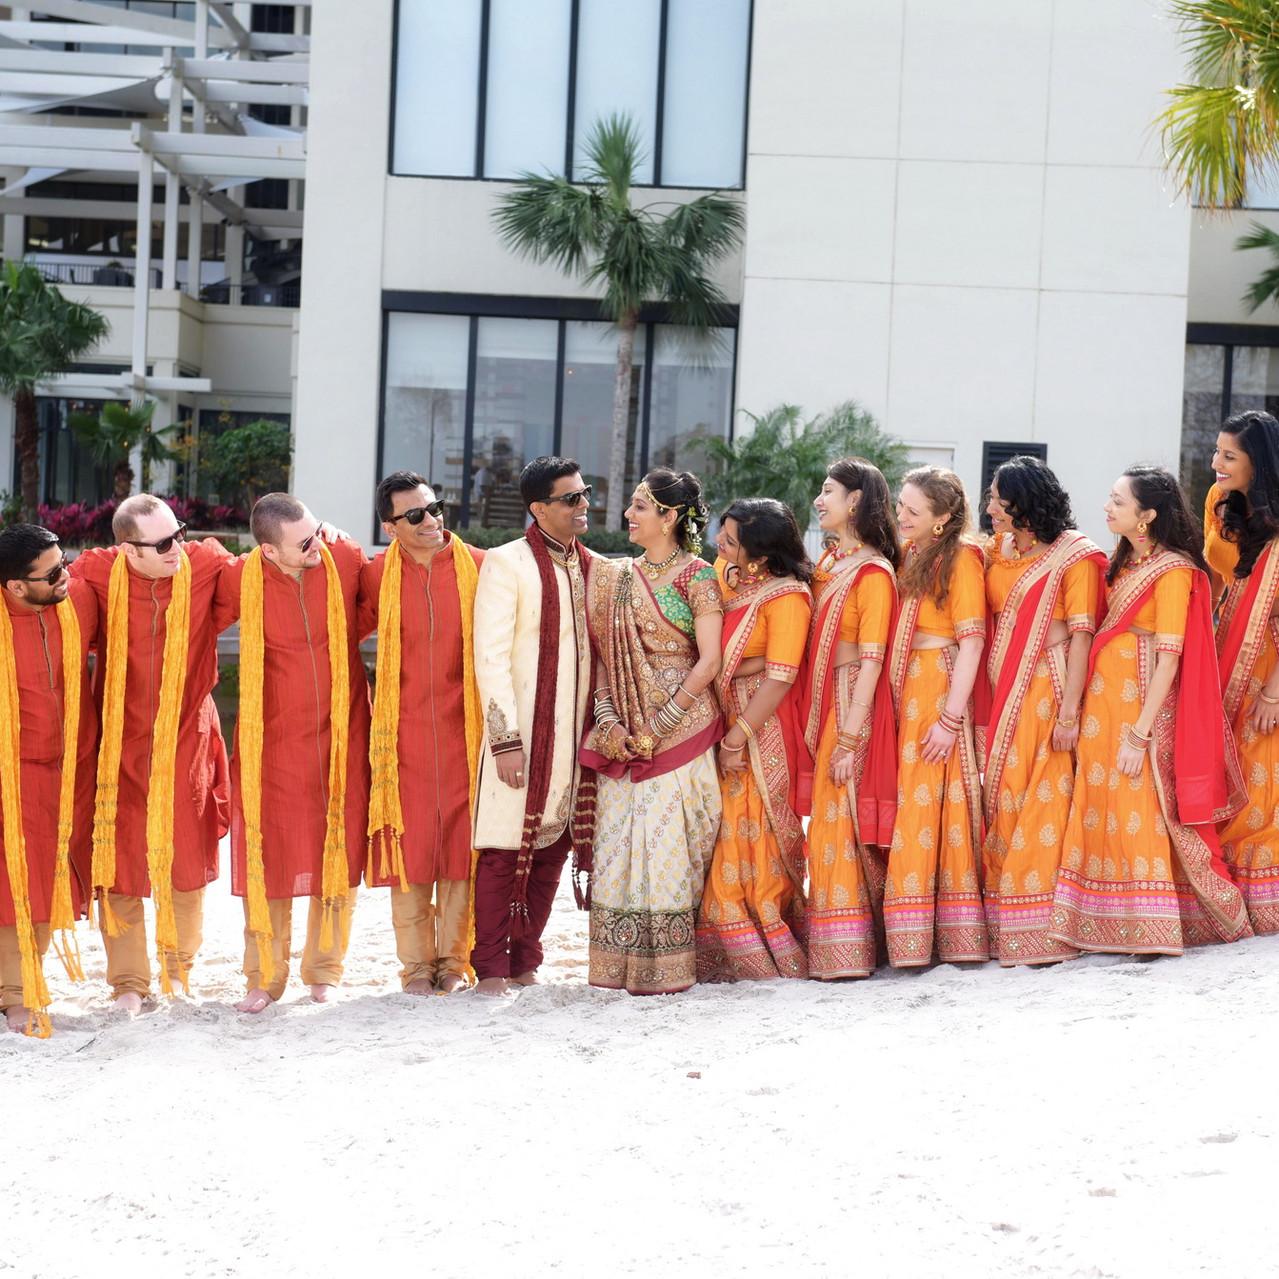 Hyatt-Regency-Grand-Cypress-Indian-Wedding-Photography-Fine-Art-Production-Amish-Thakkar_32